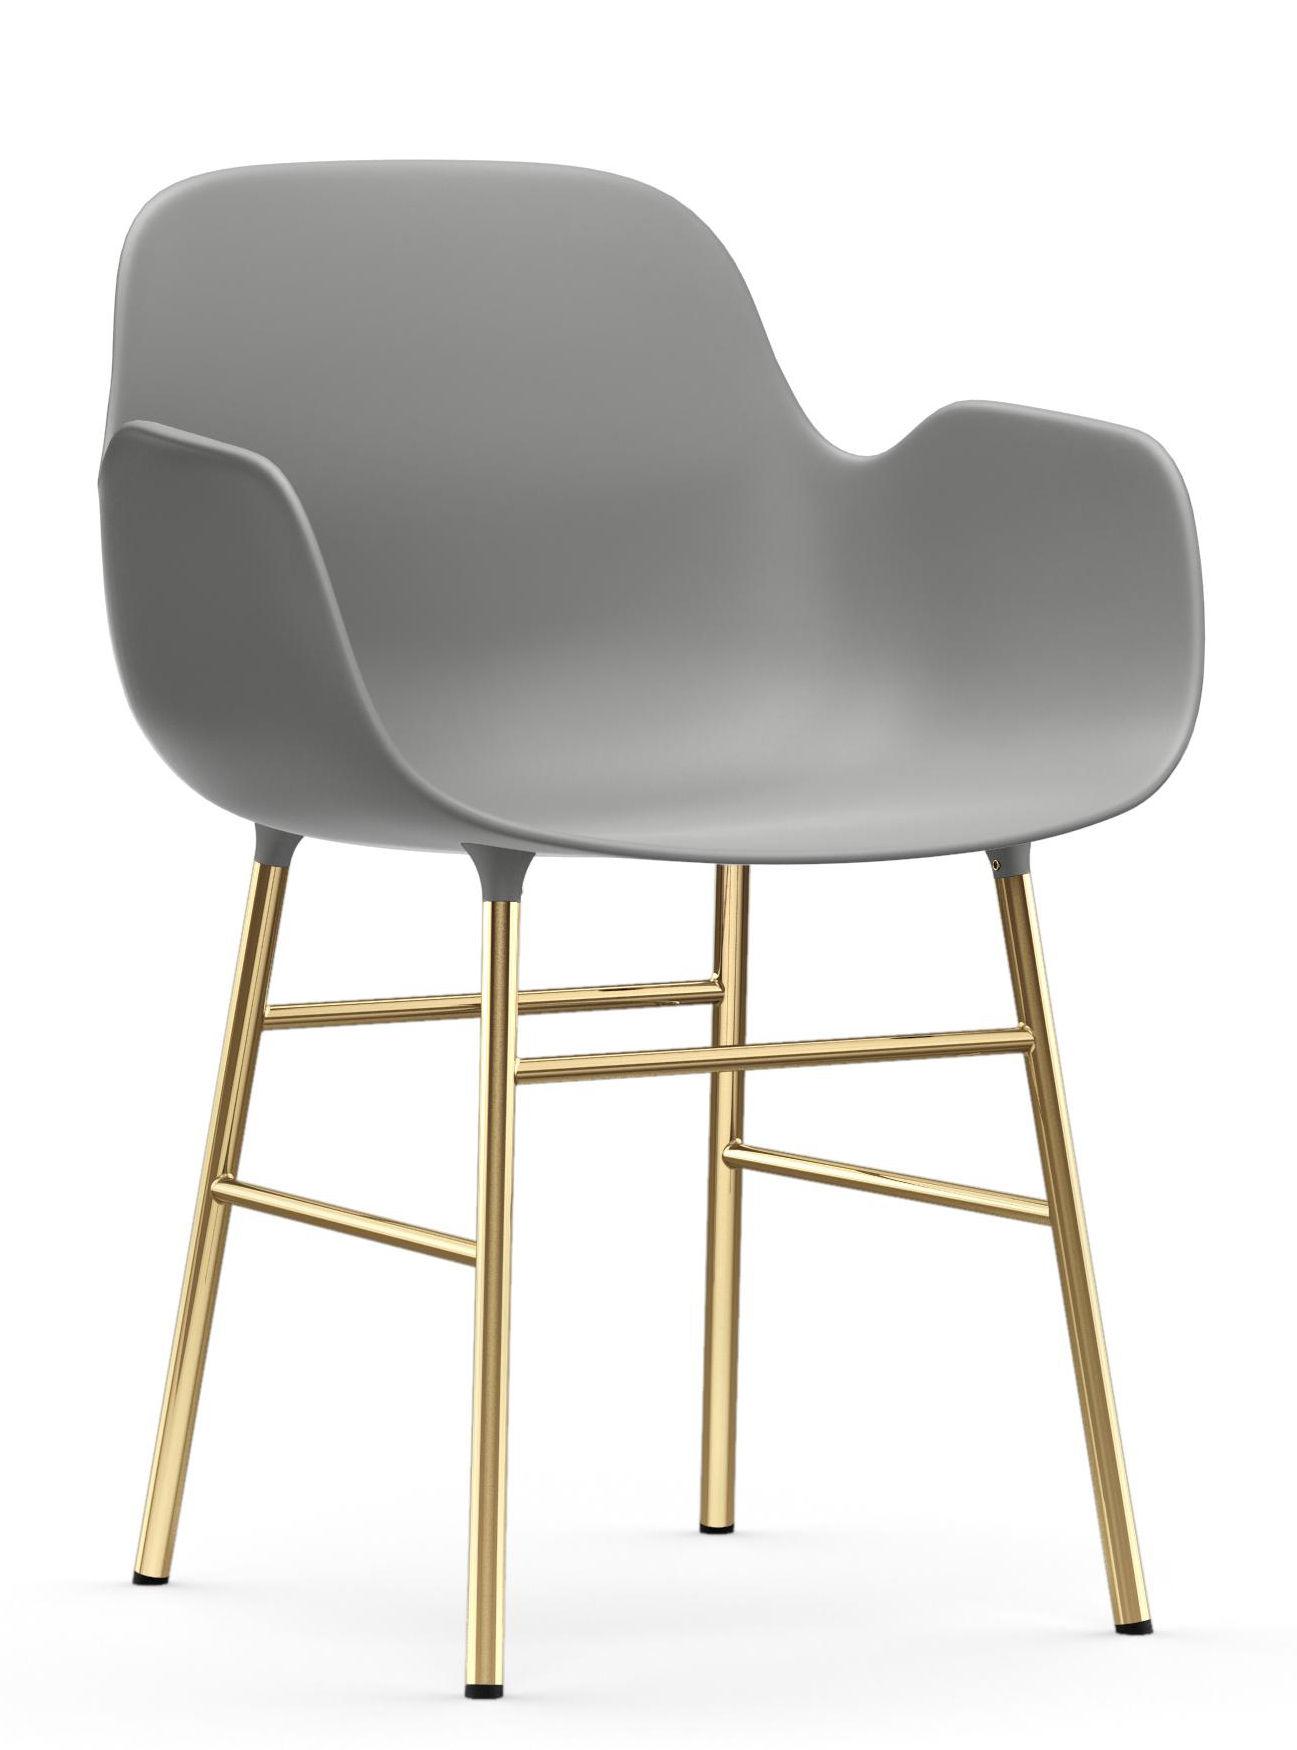 fauteuil form normann copenhagen gris laiton l 56 x h 80 made in design. Black Bedroom Furniture Sets. Home Design Ideas